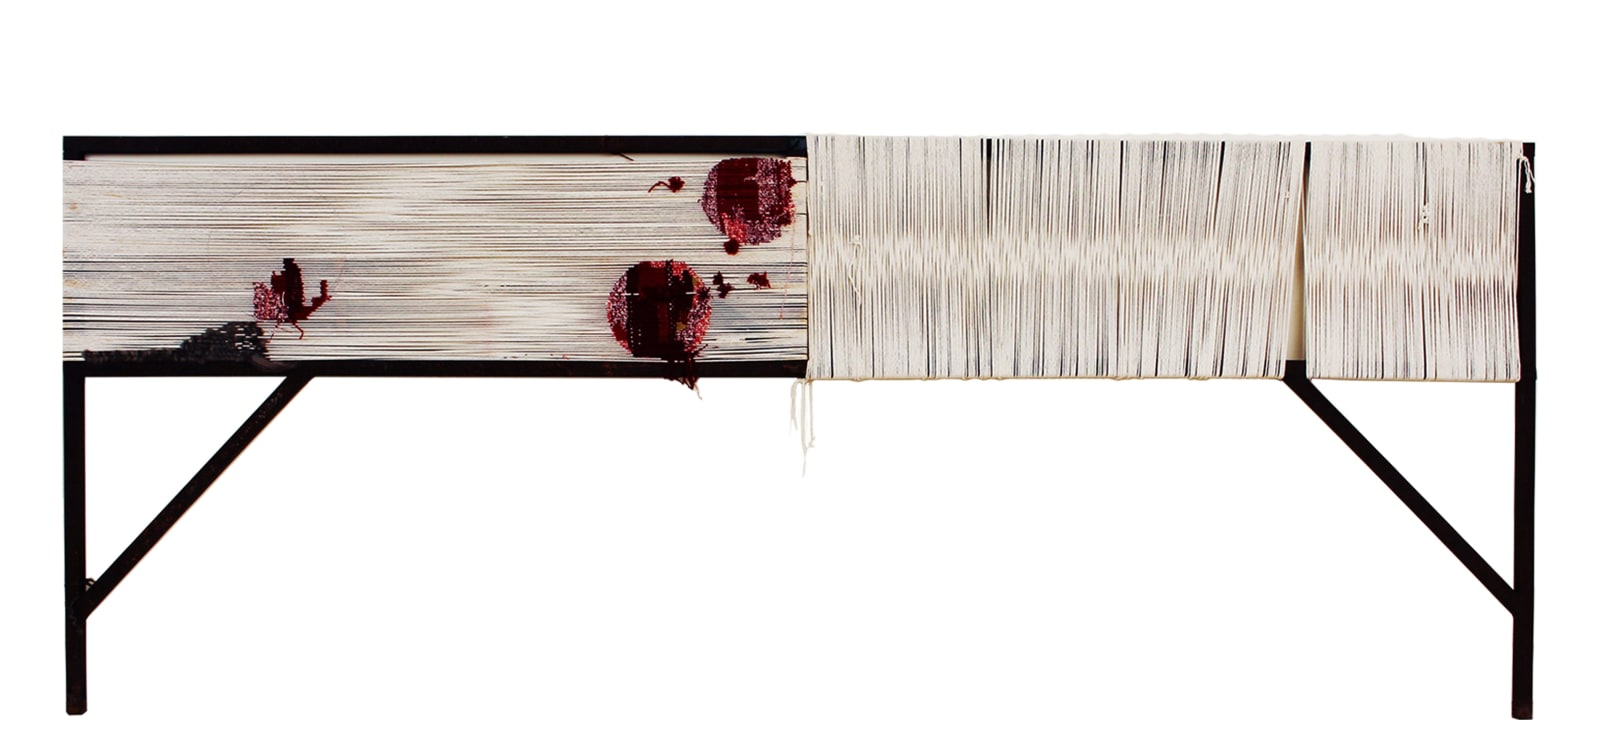 Toni Ross Marking Time, 2021 Cotton, wool, steel armature 46 x 116 1/4 x 2 in. (TR 211) $23,000